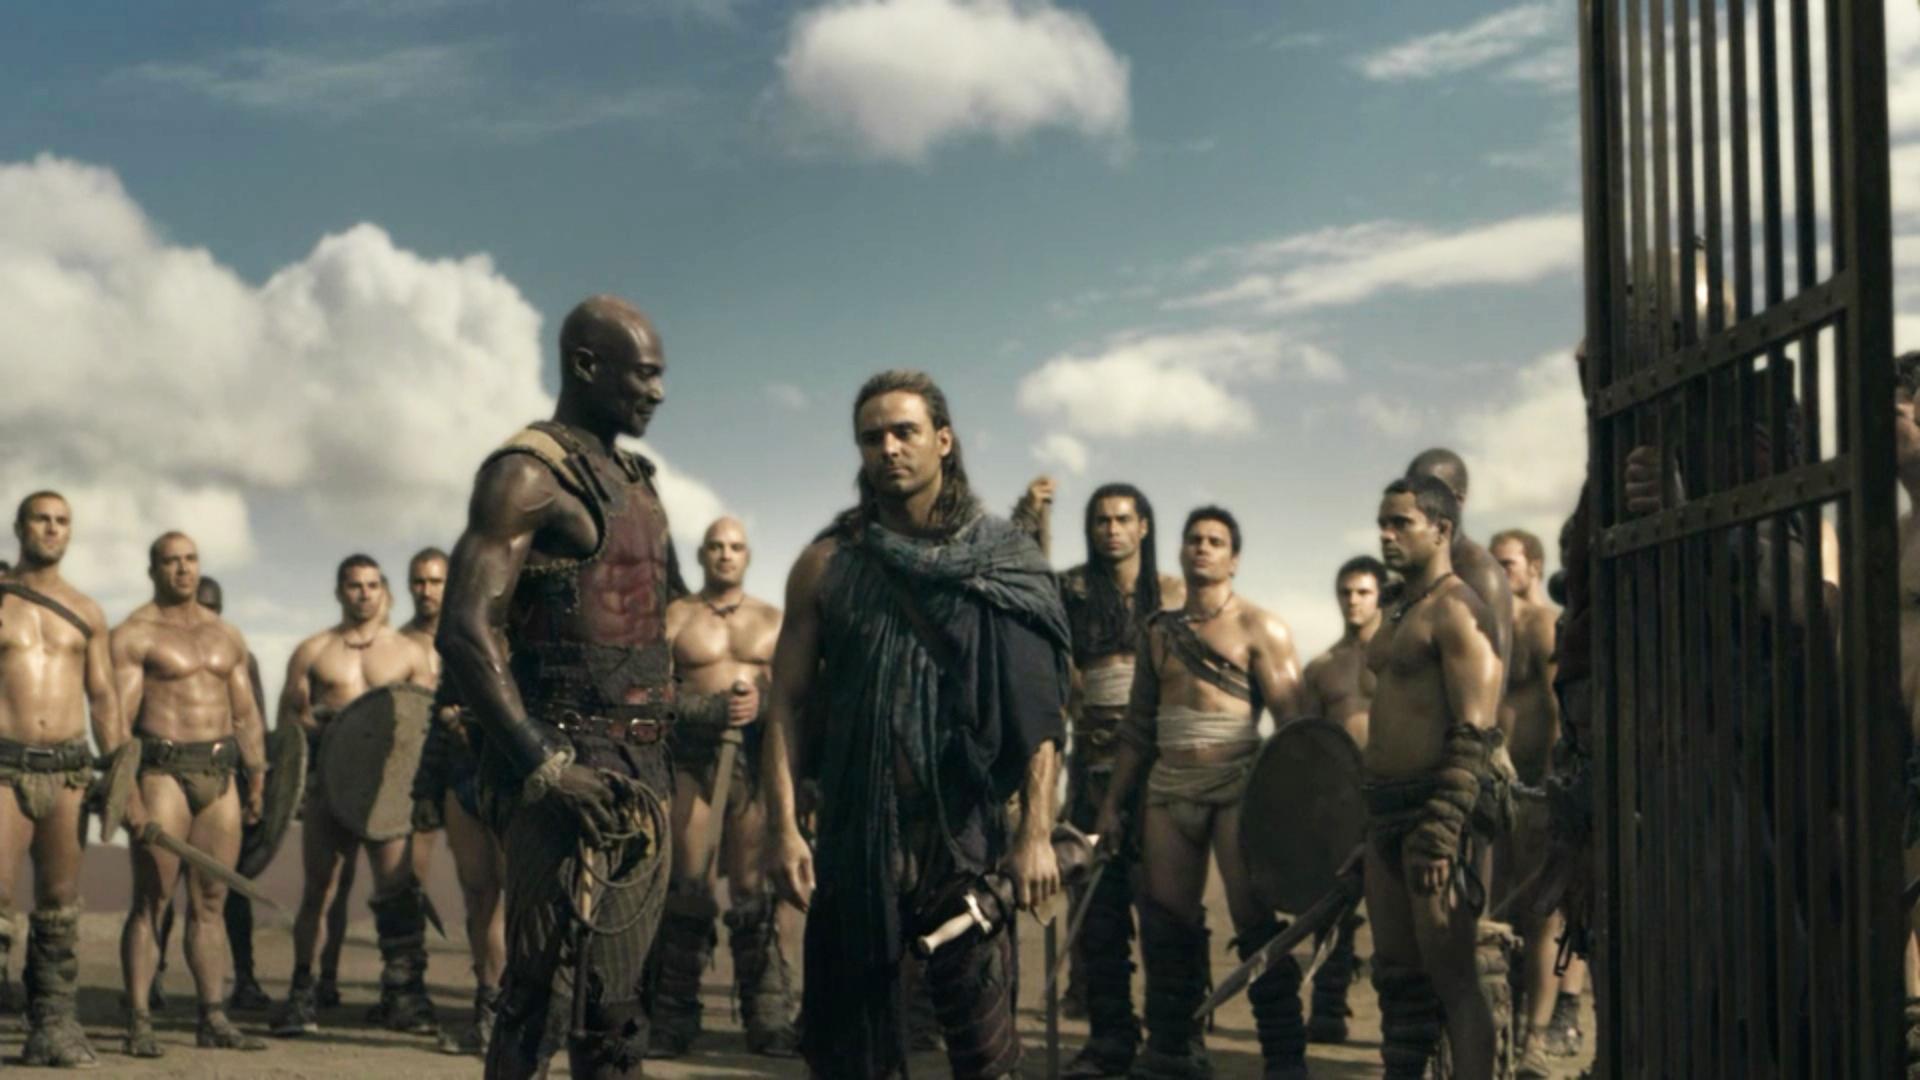 spartacus season 1 episode 1 mp4 free download